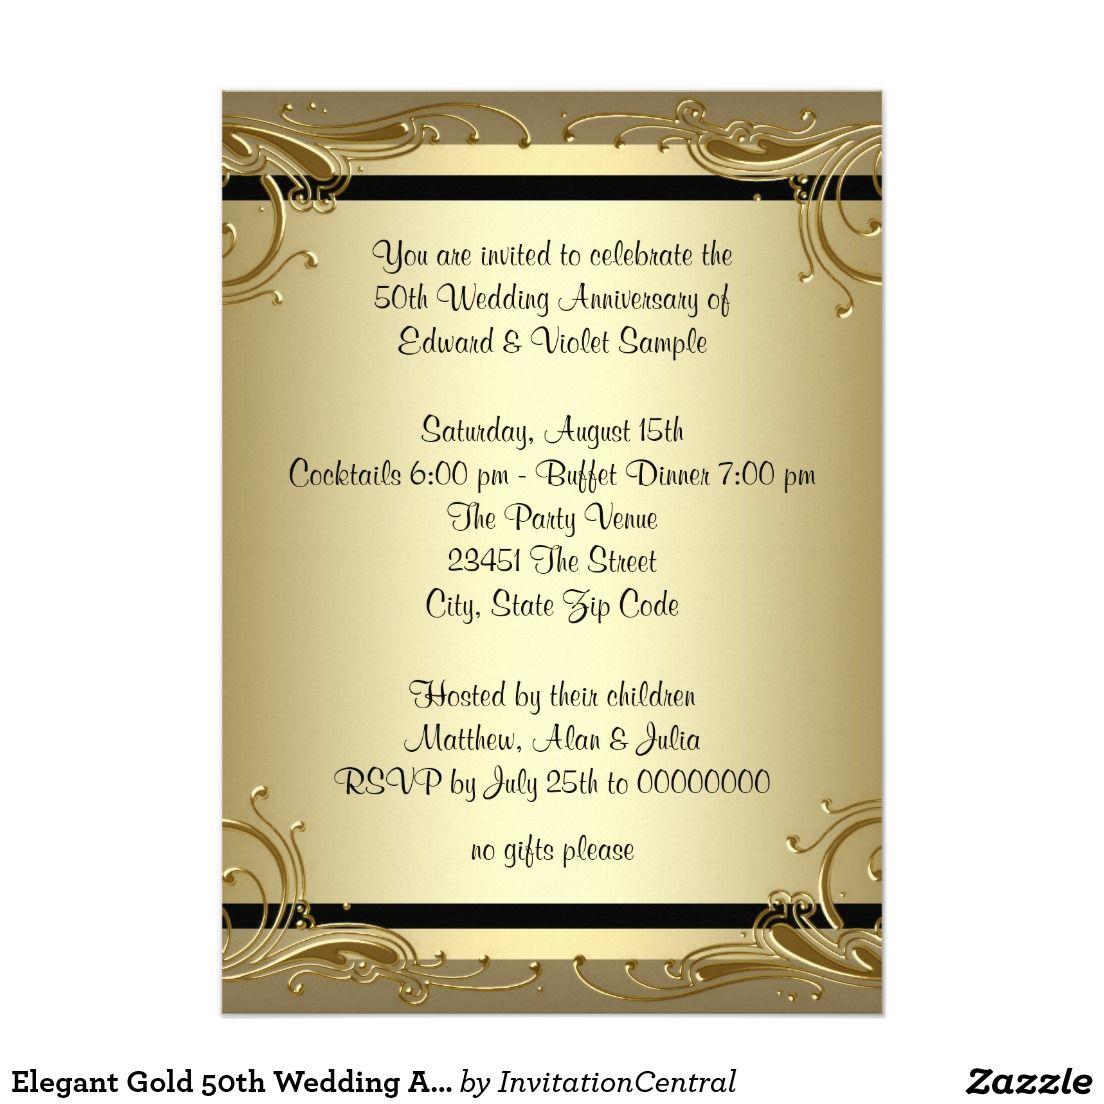 Golden Jubilee Wedding Anniversary Invitation Cards rugalah – Golden Wedding Party Invitations